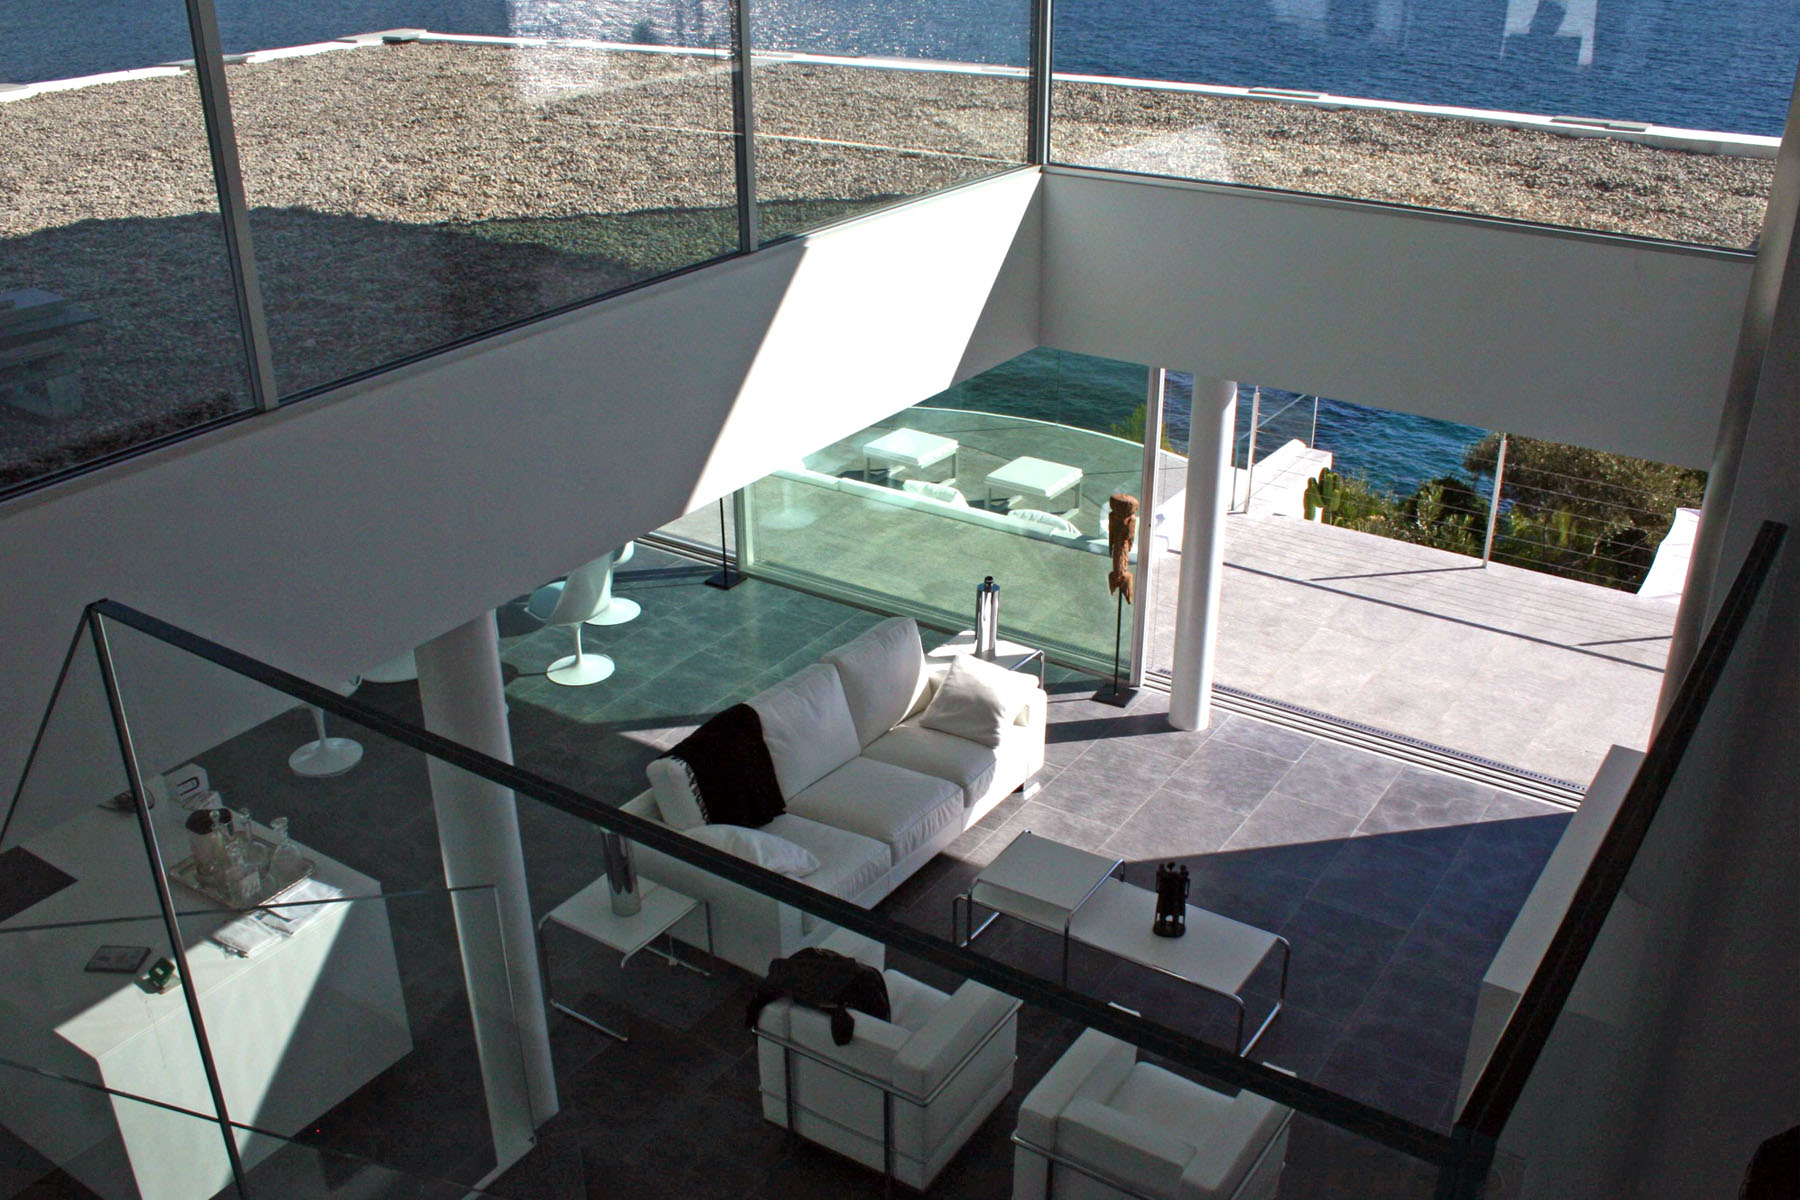 G1-Florence_Watine_Architecte_Designer_Decoratrice_Paris_France_ARCHI_MAISONG1